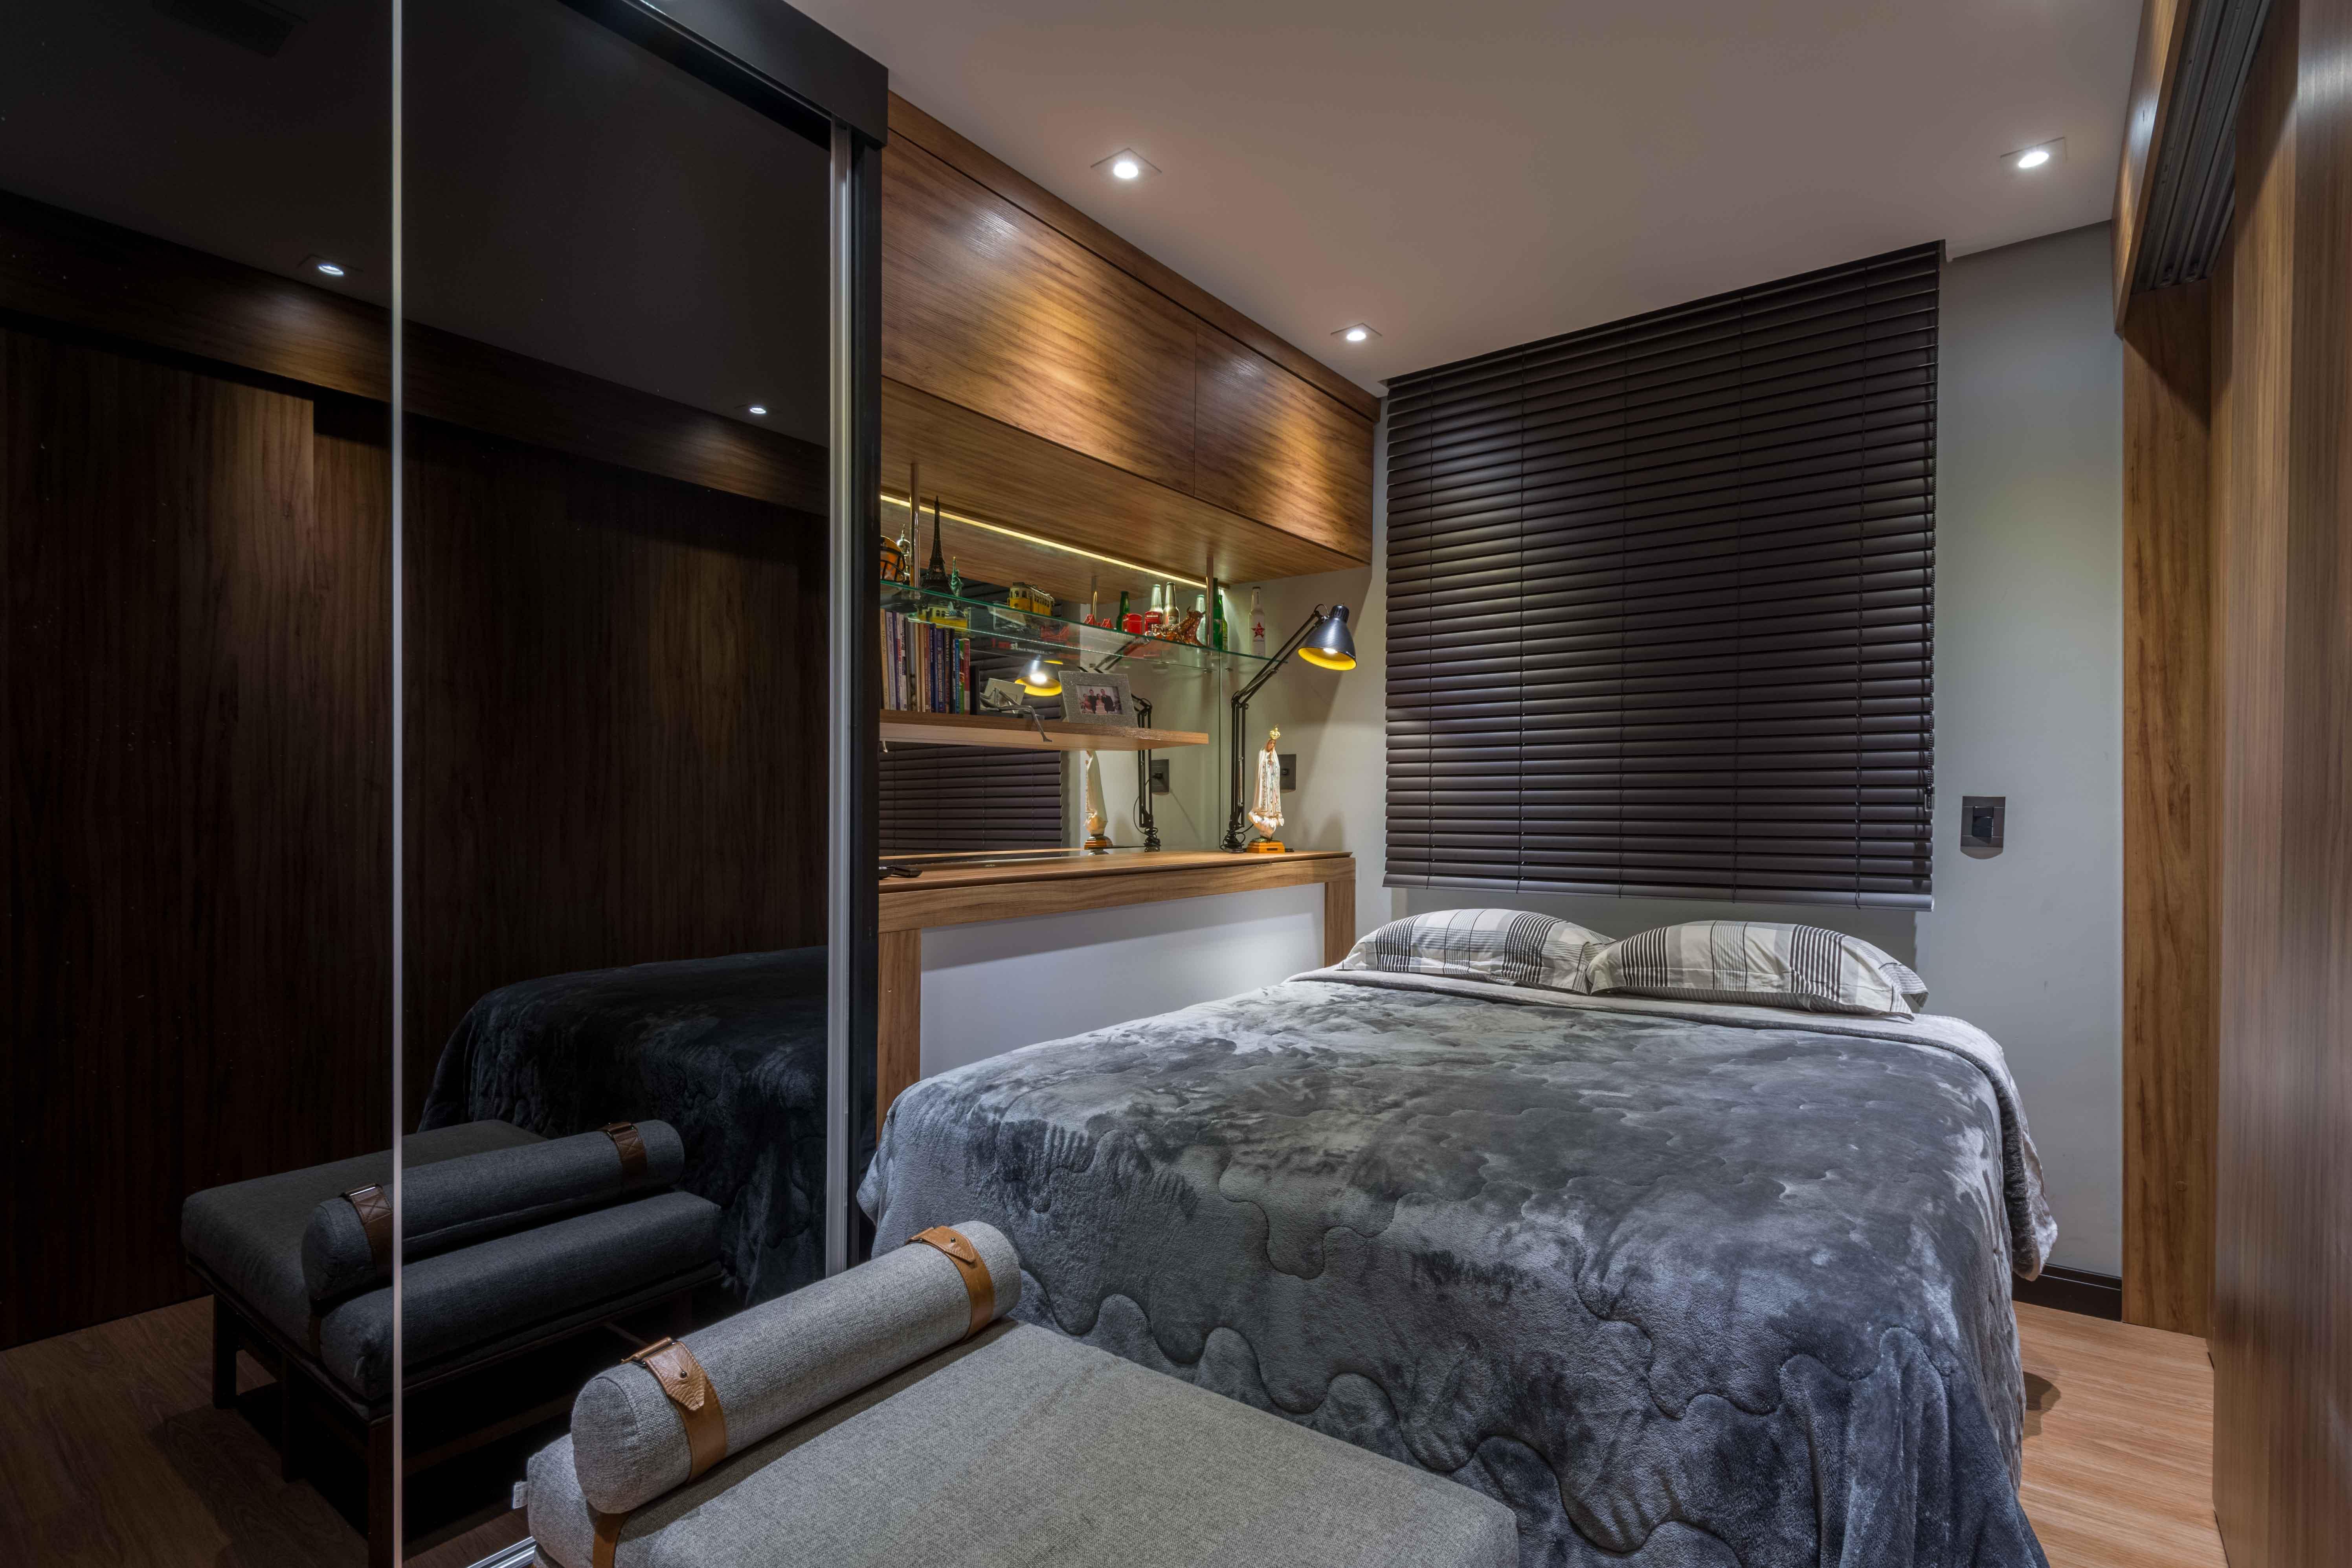 residencia-varandas-mazzark-arquitetura-quarto-casal-design-interiores